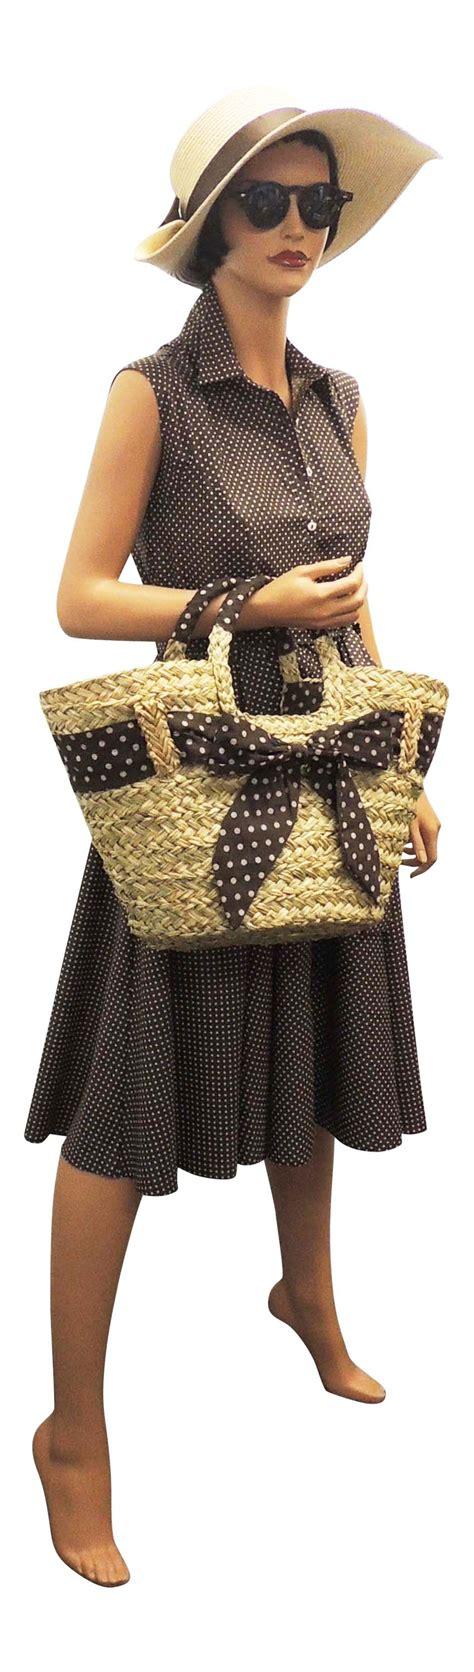 Oz Sweater Polka Abu new retro vtg 1940 s 1950 s shirt tea dress with small polka dots